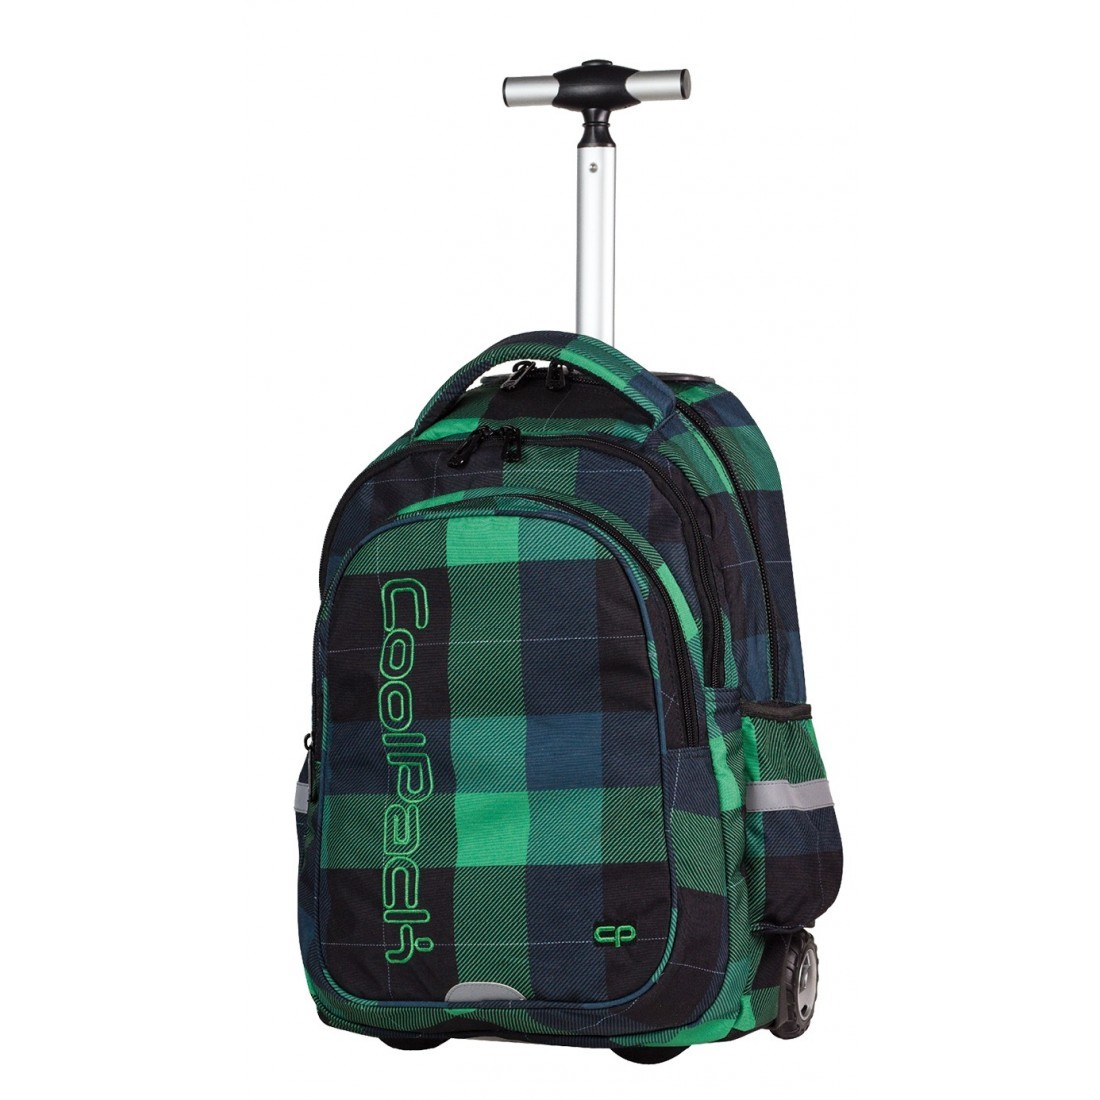 Plecak na kółkach CoolPack Junior OXFORD CP 494 - plecak-tornister.pl